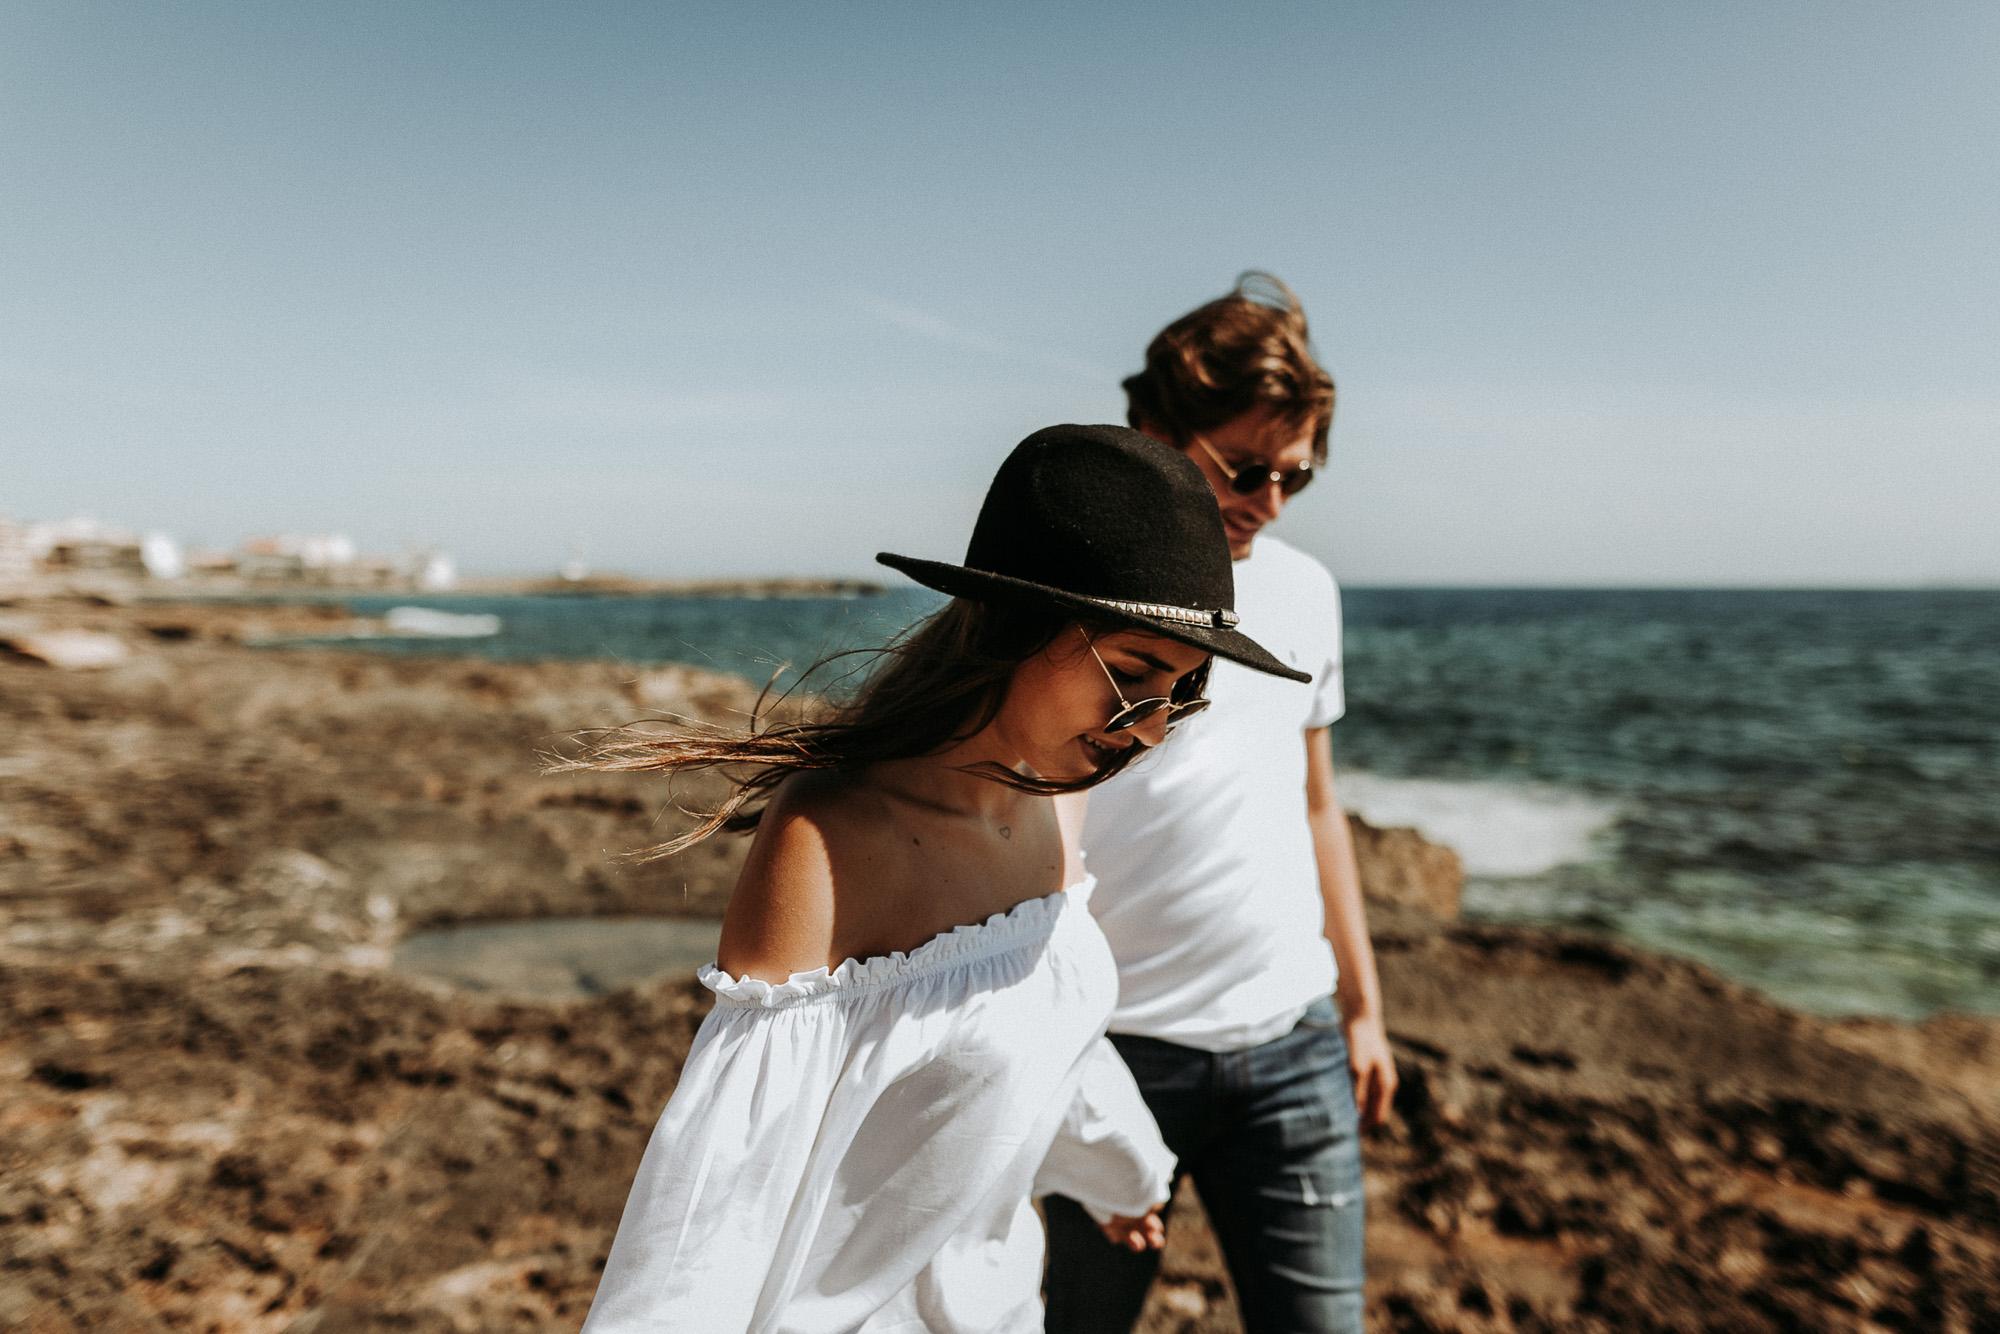 DanielaMarquardtPhotography_wedding_elopement_mallorca_spain_stjordi_sessalines_marinaandxavi63